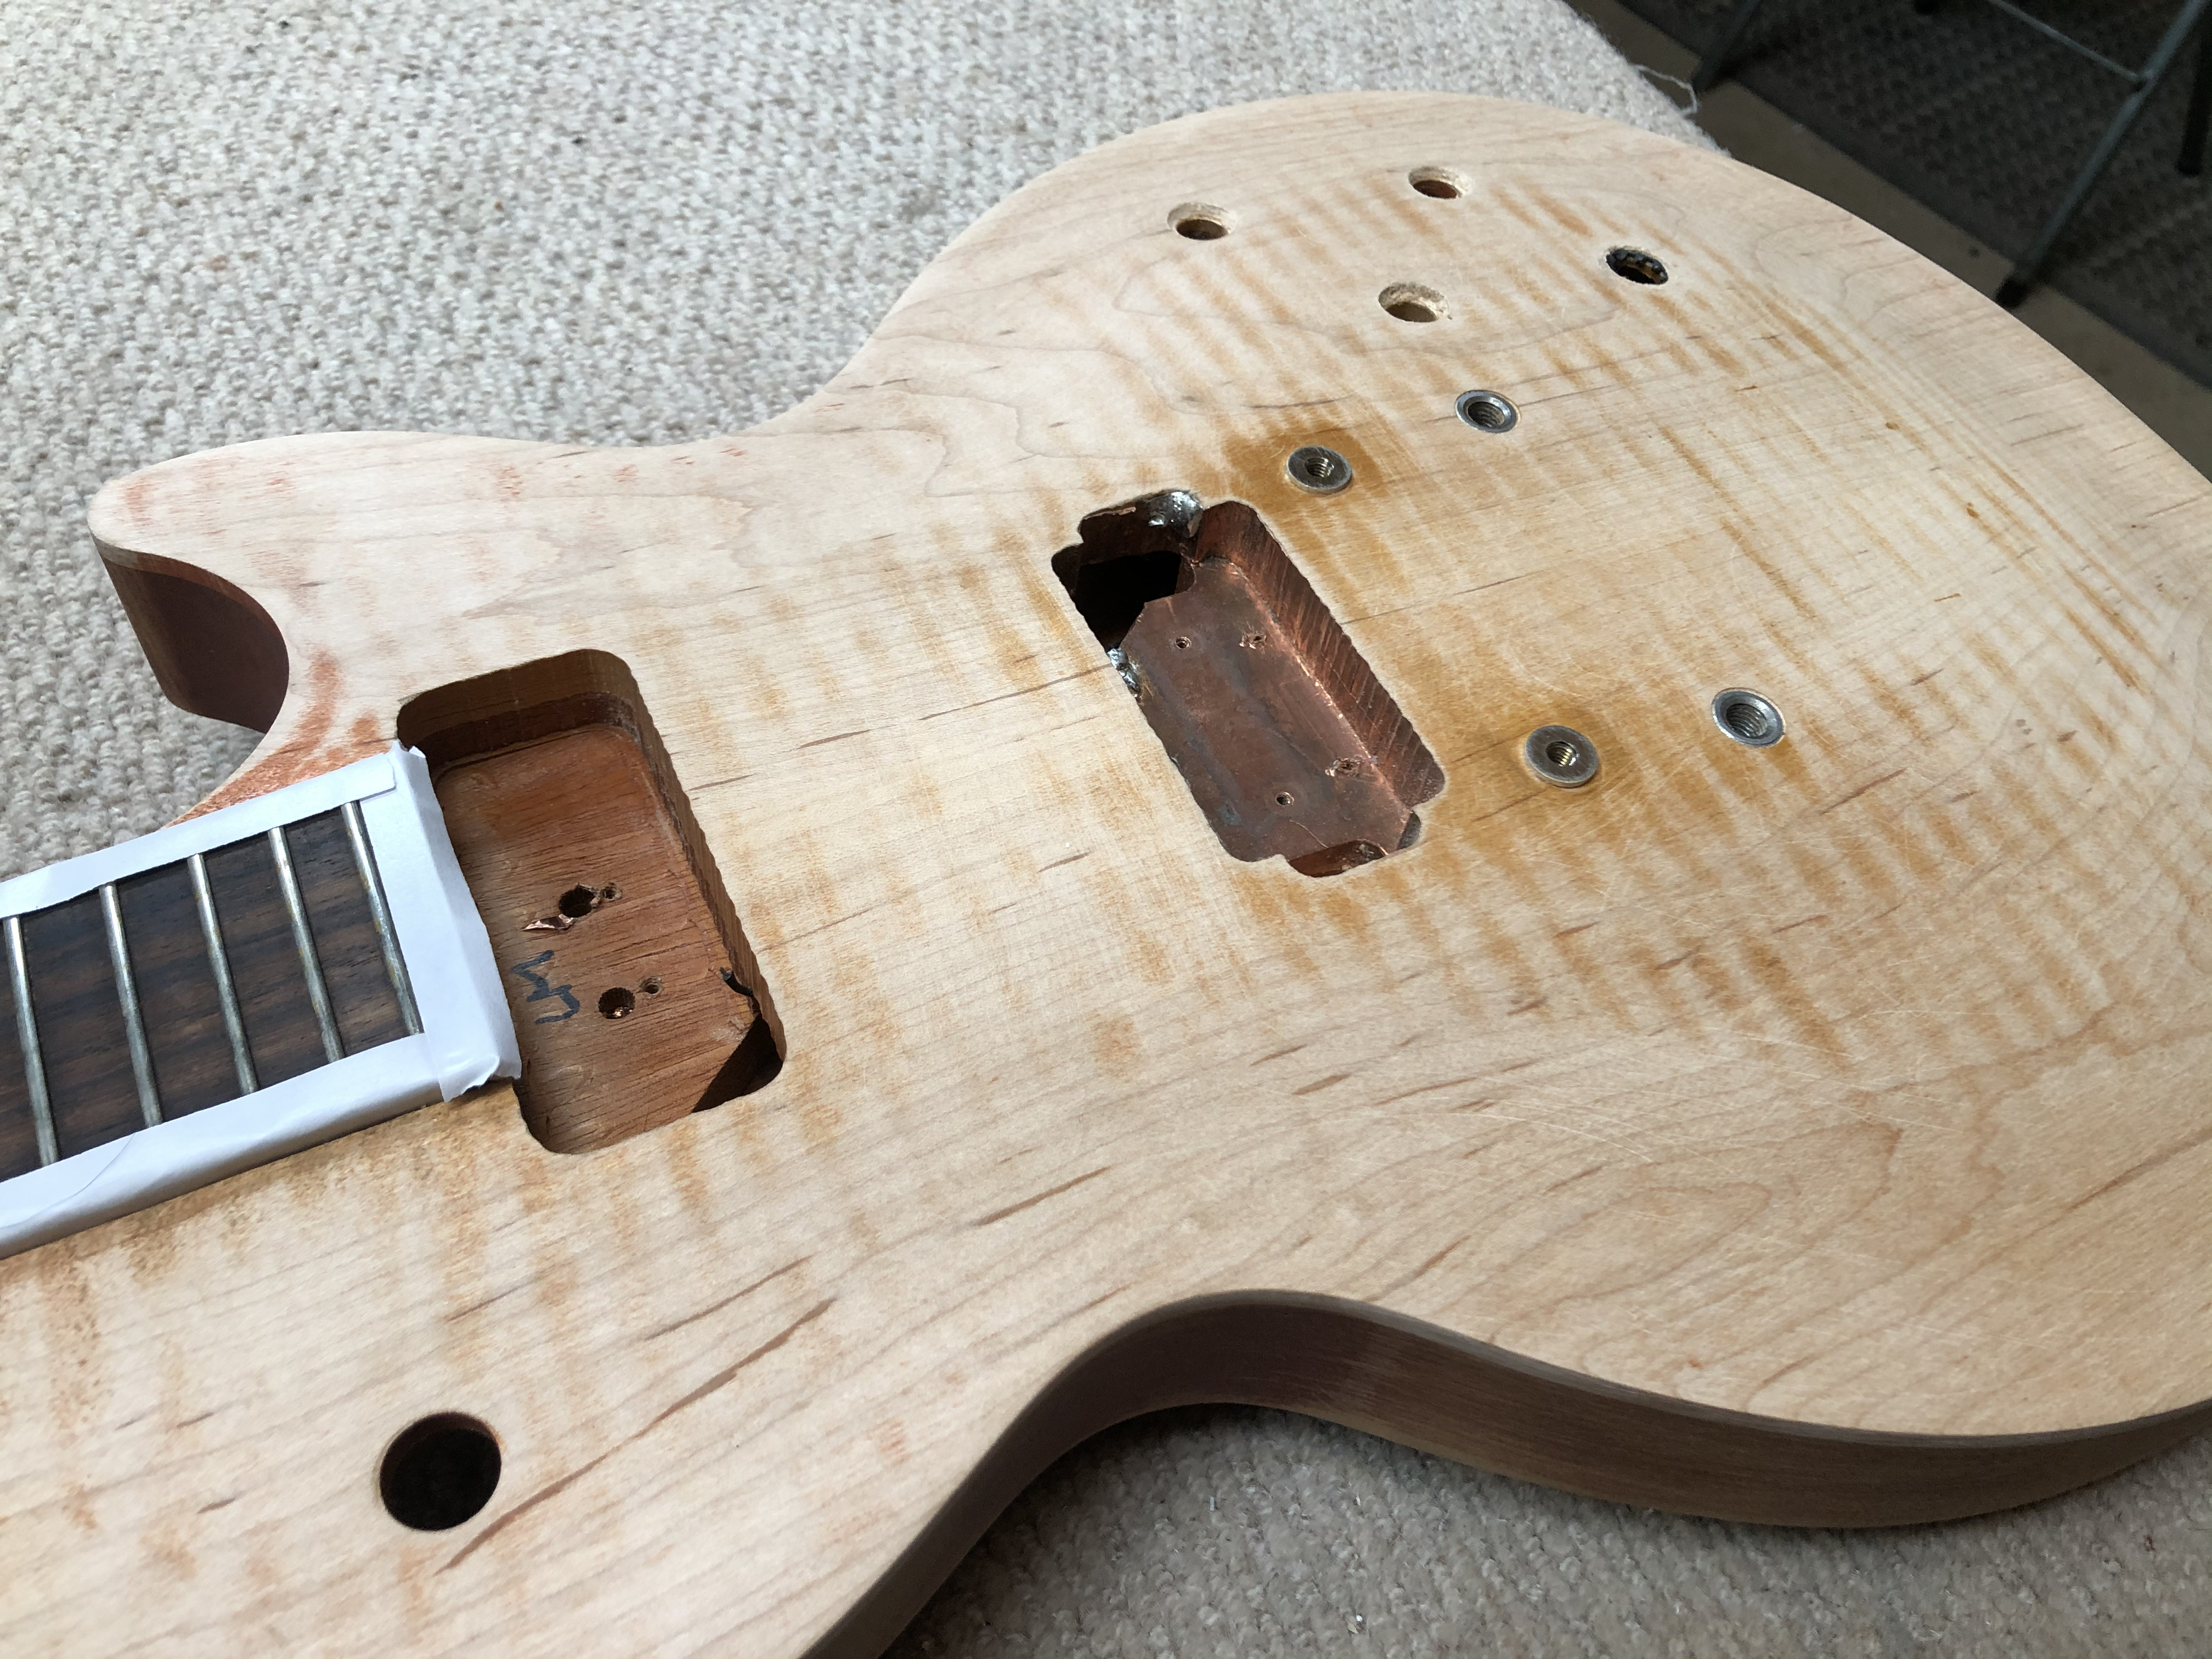 Gibson Les Paul Conversion